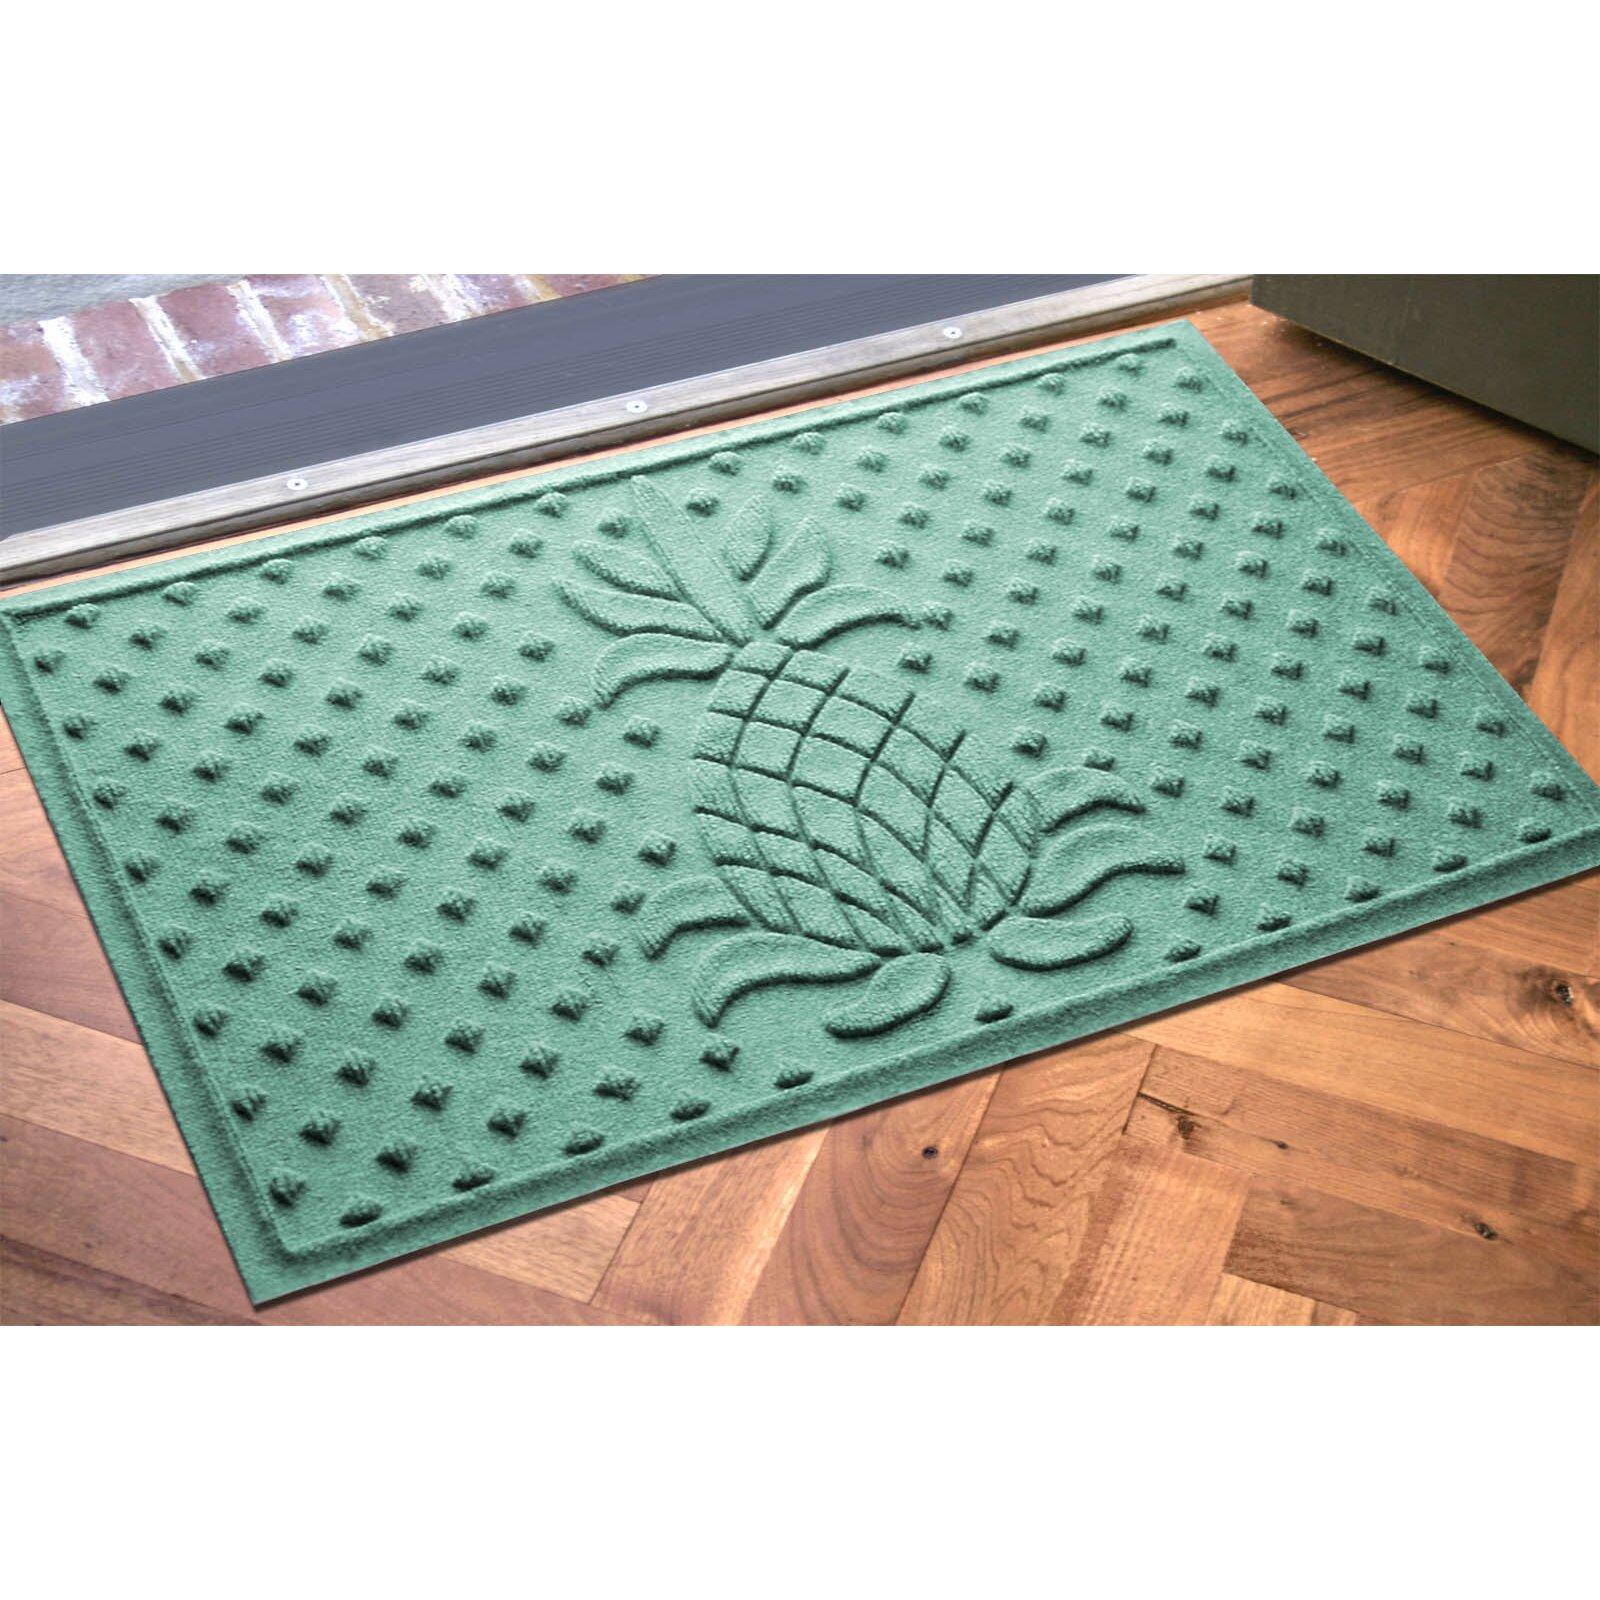 Bungalow Flooring Aqua Shield Diamond Pineapple Doormat